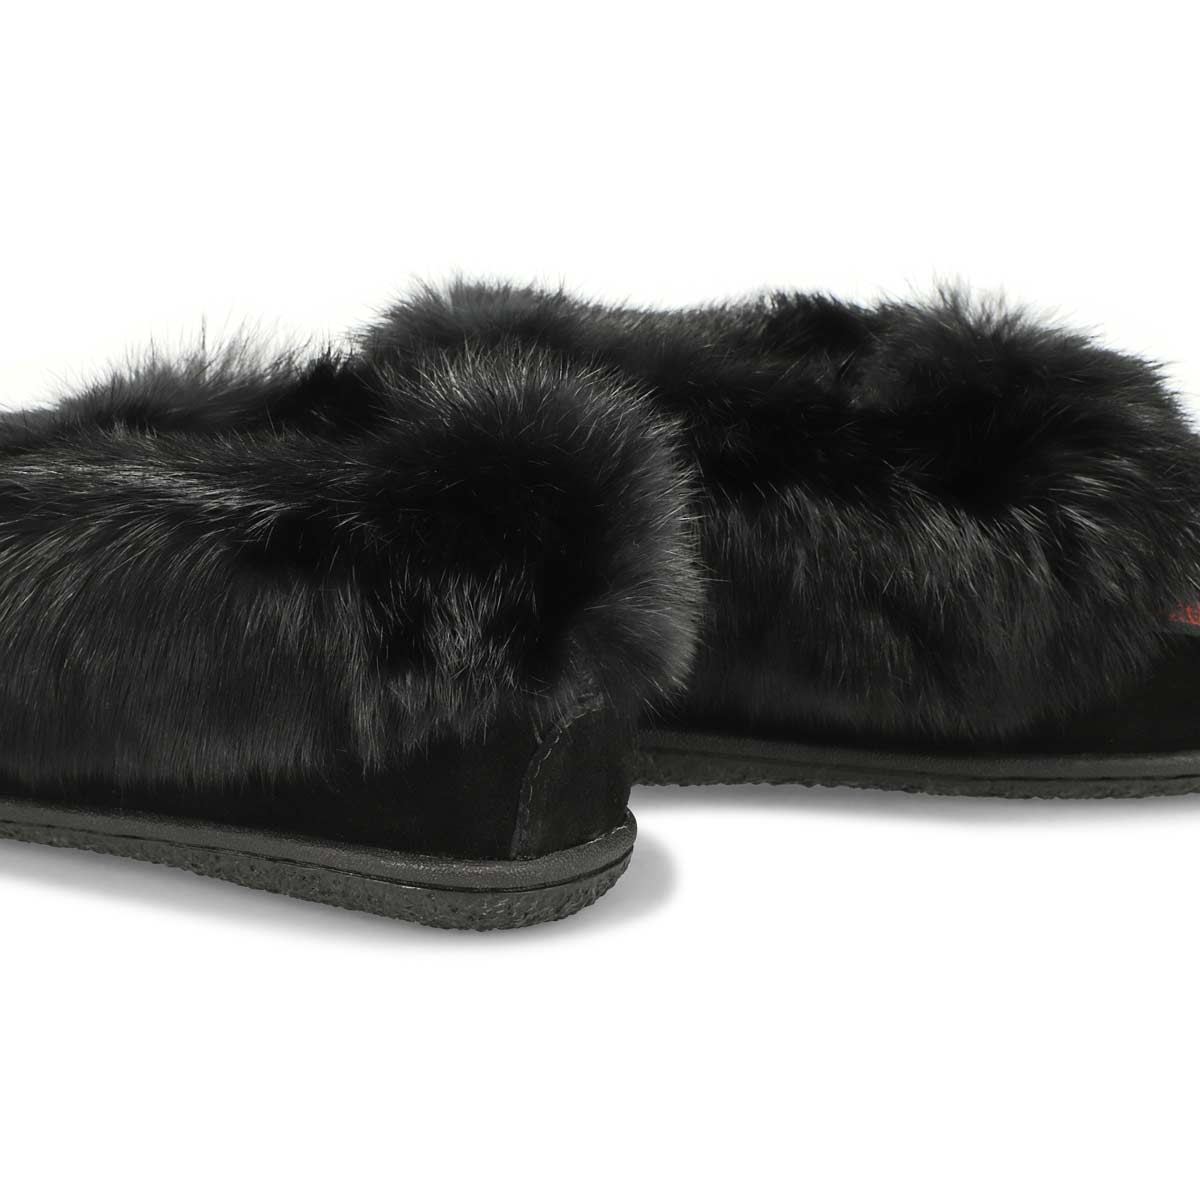 Women's Cute 5 Rabbit Fur Moccasin - Black Black